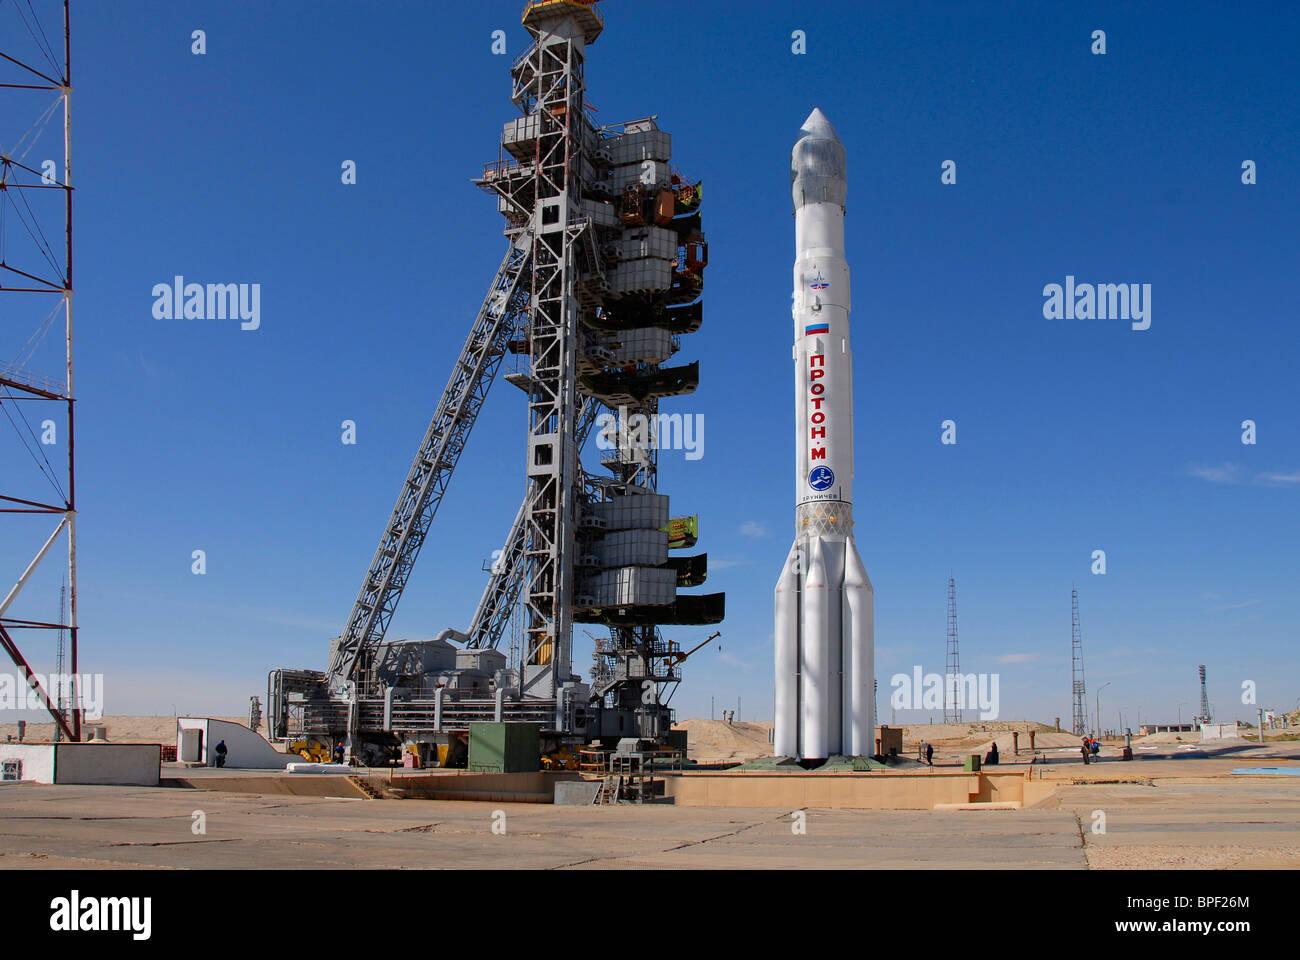 Russia launches three GLONASS satellites into orbit - Stock Image